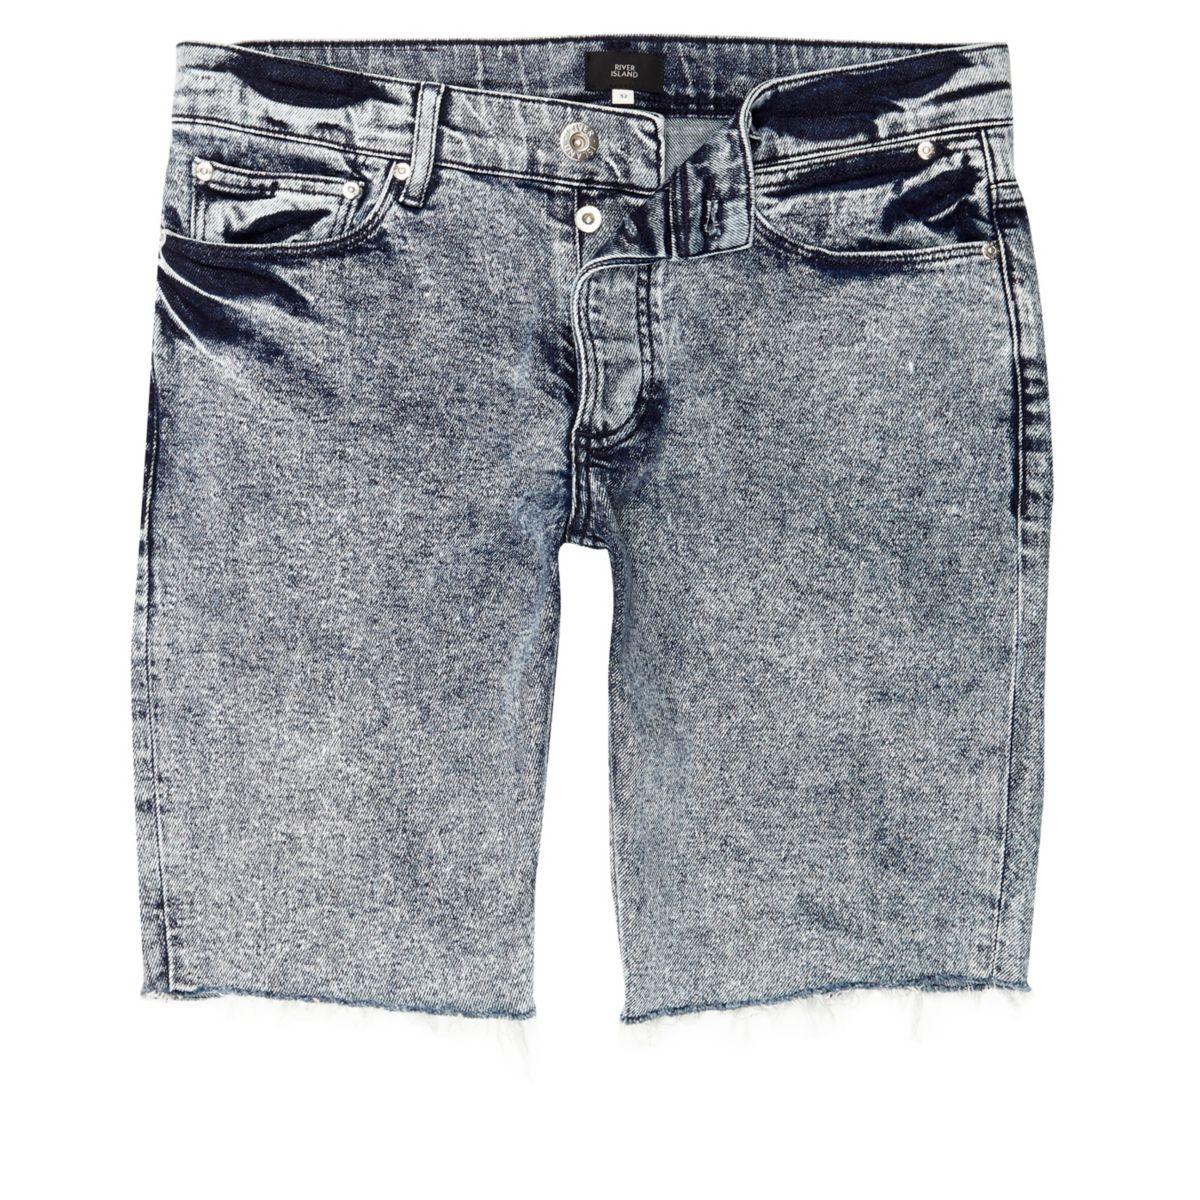 blaue skinny fit jeans in acid waschung shorts sale. Black Bedroom Furniture Sets. Home Design Ideas